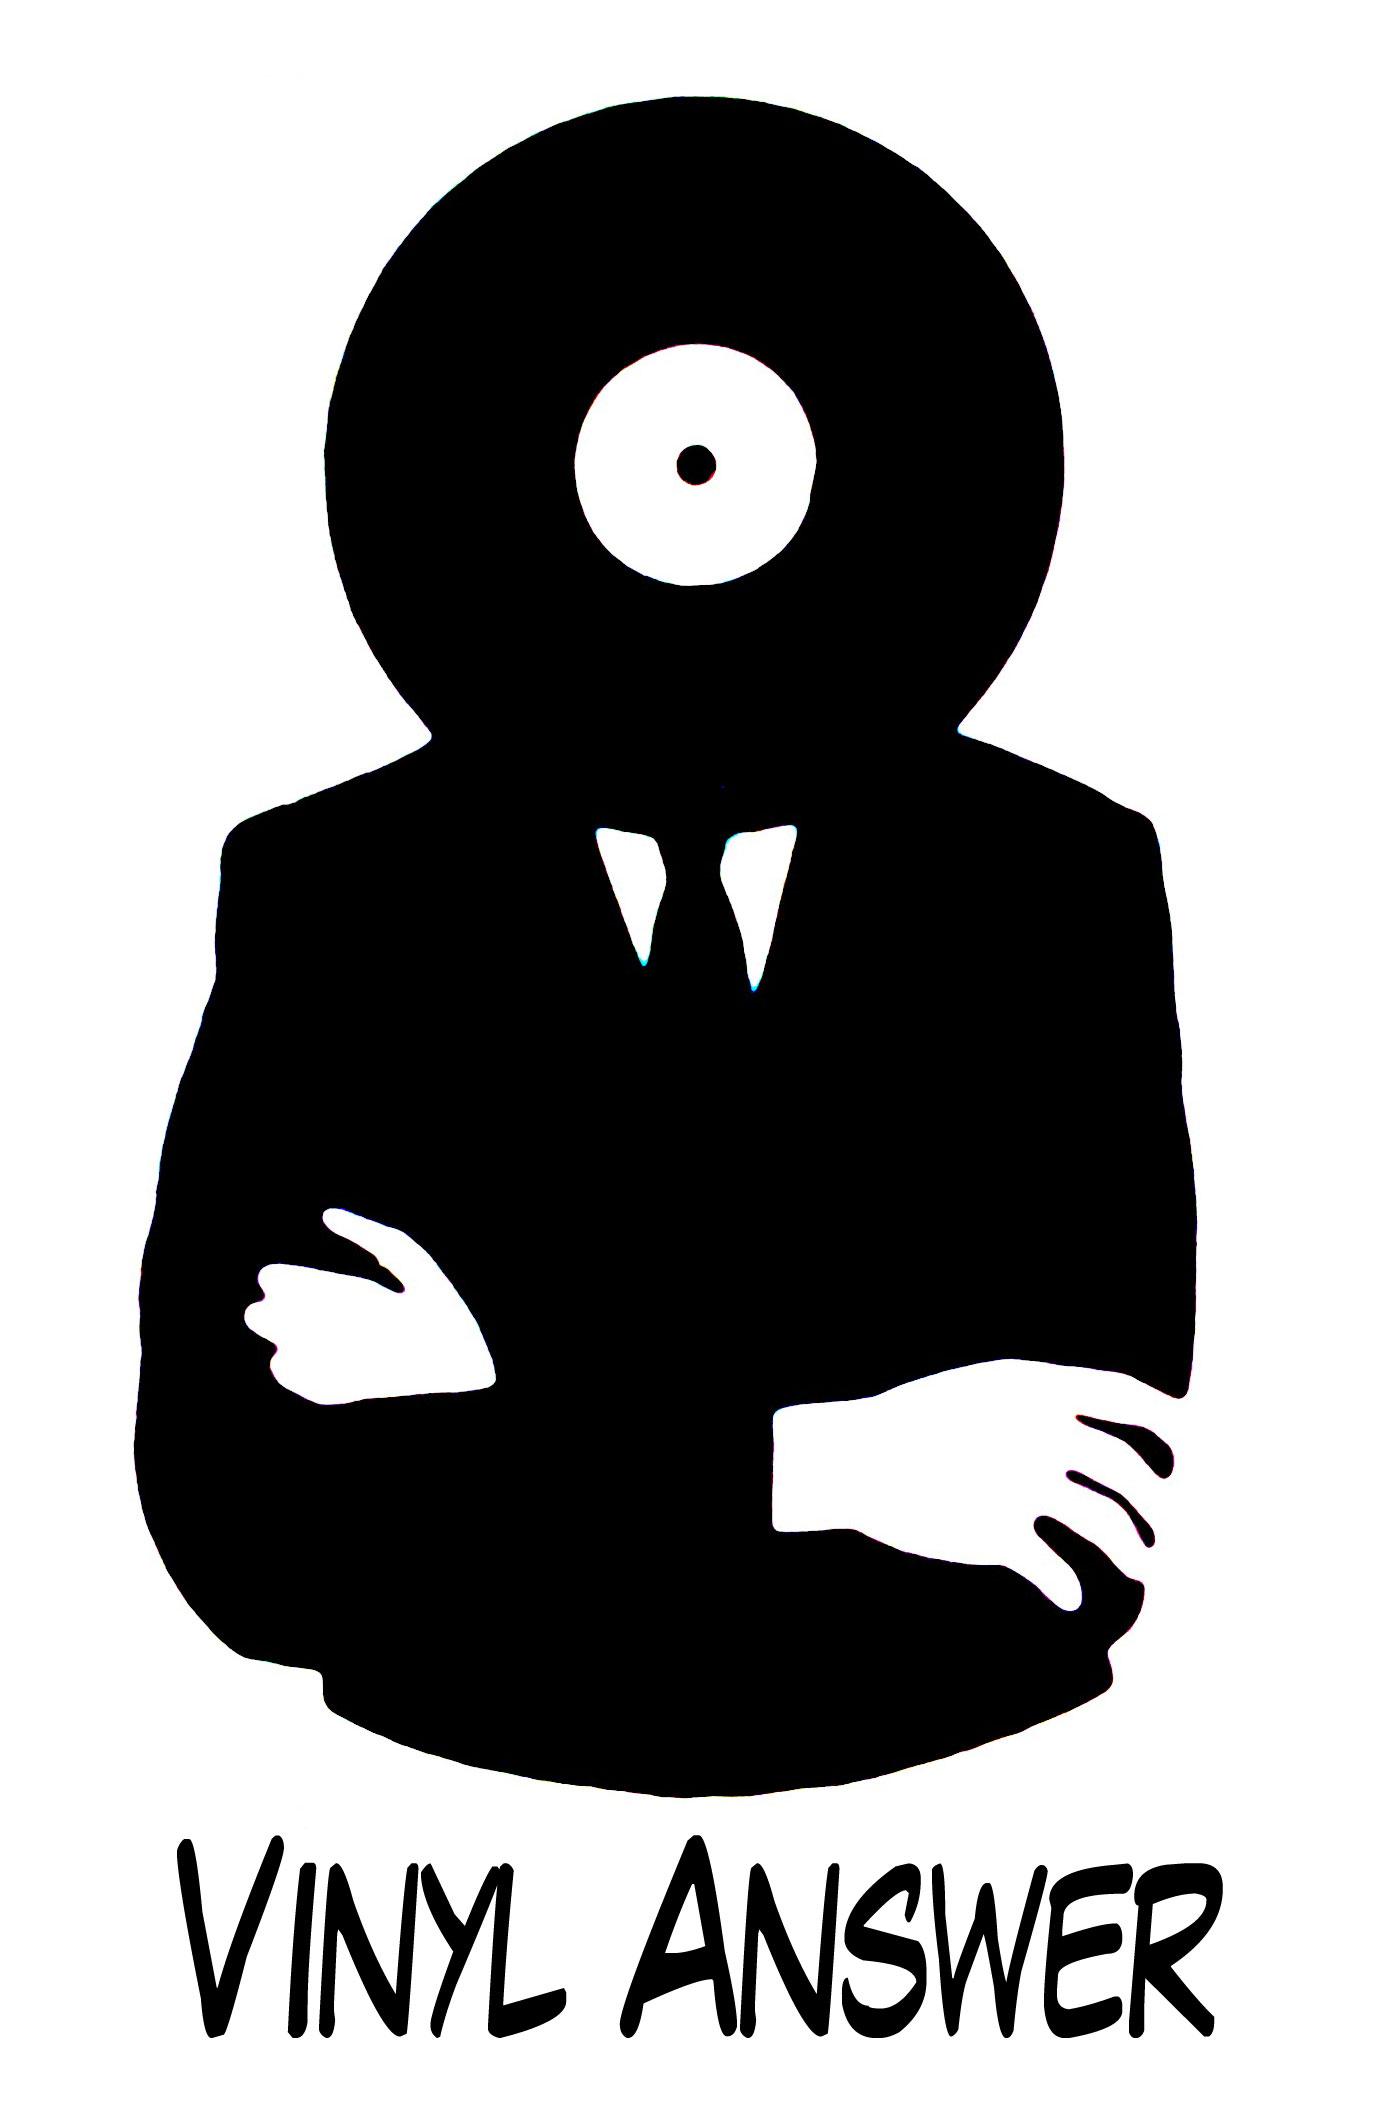 Vinyl Answer